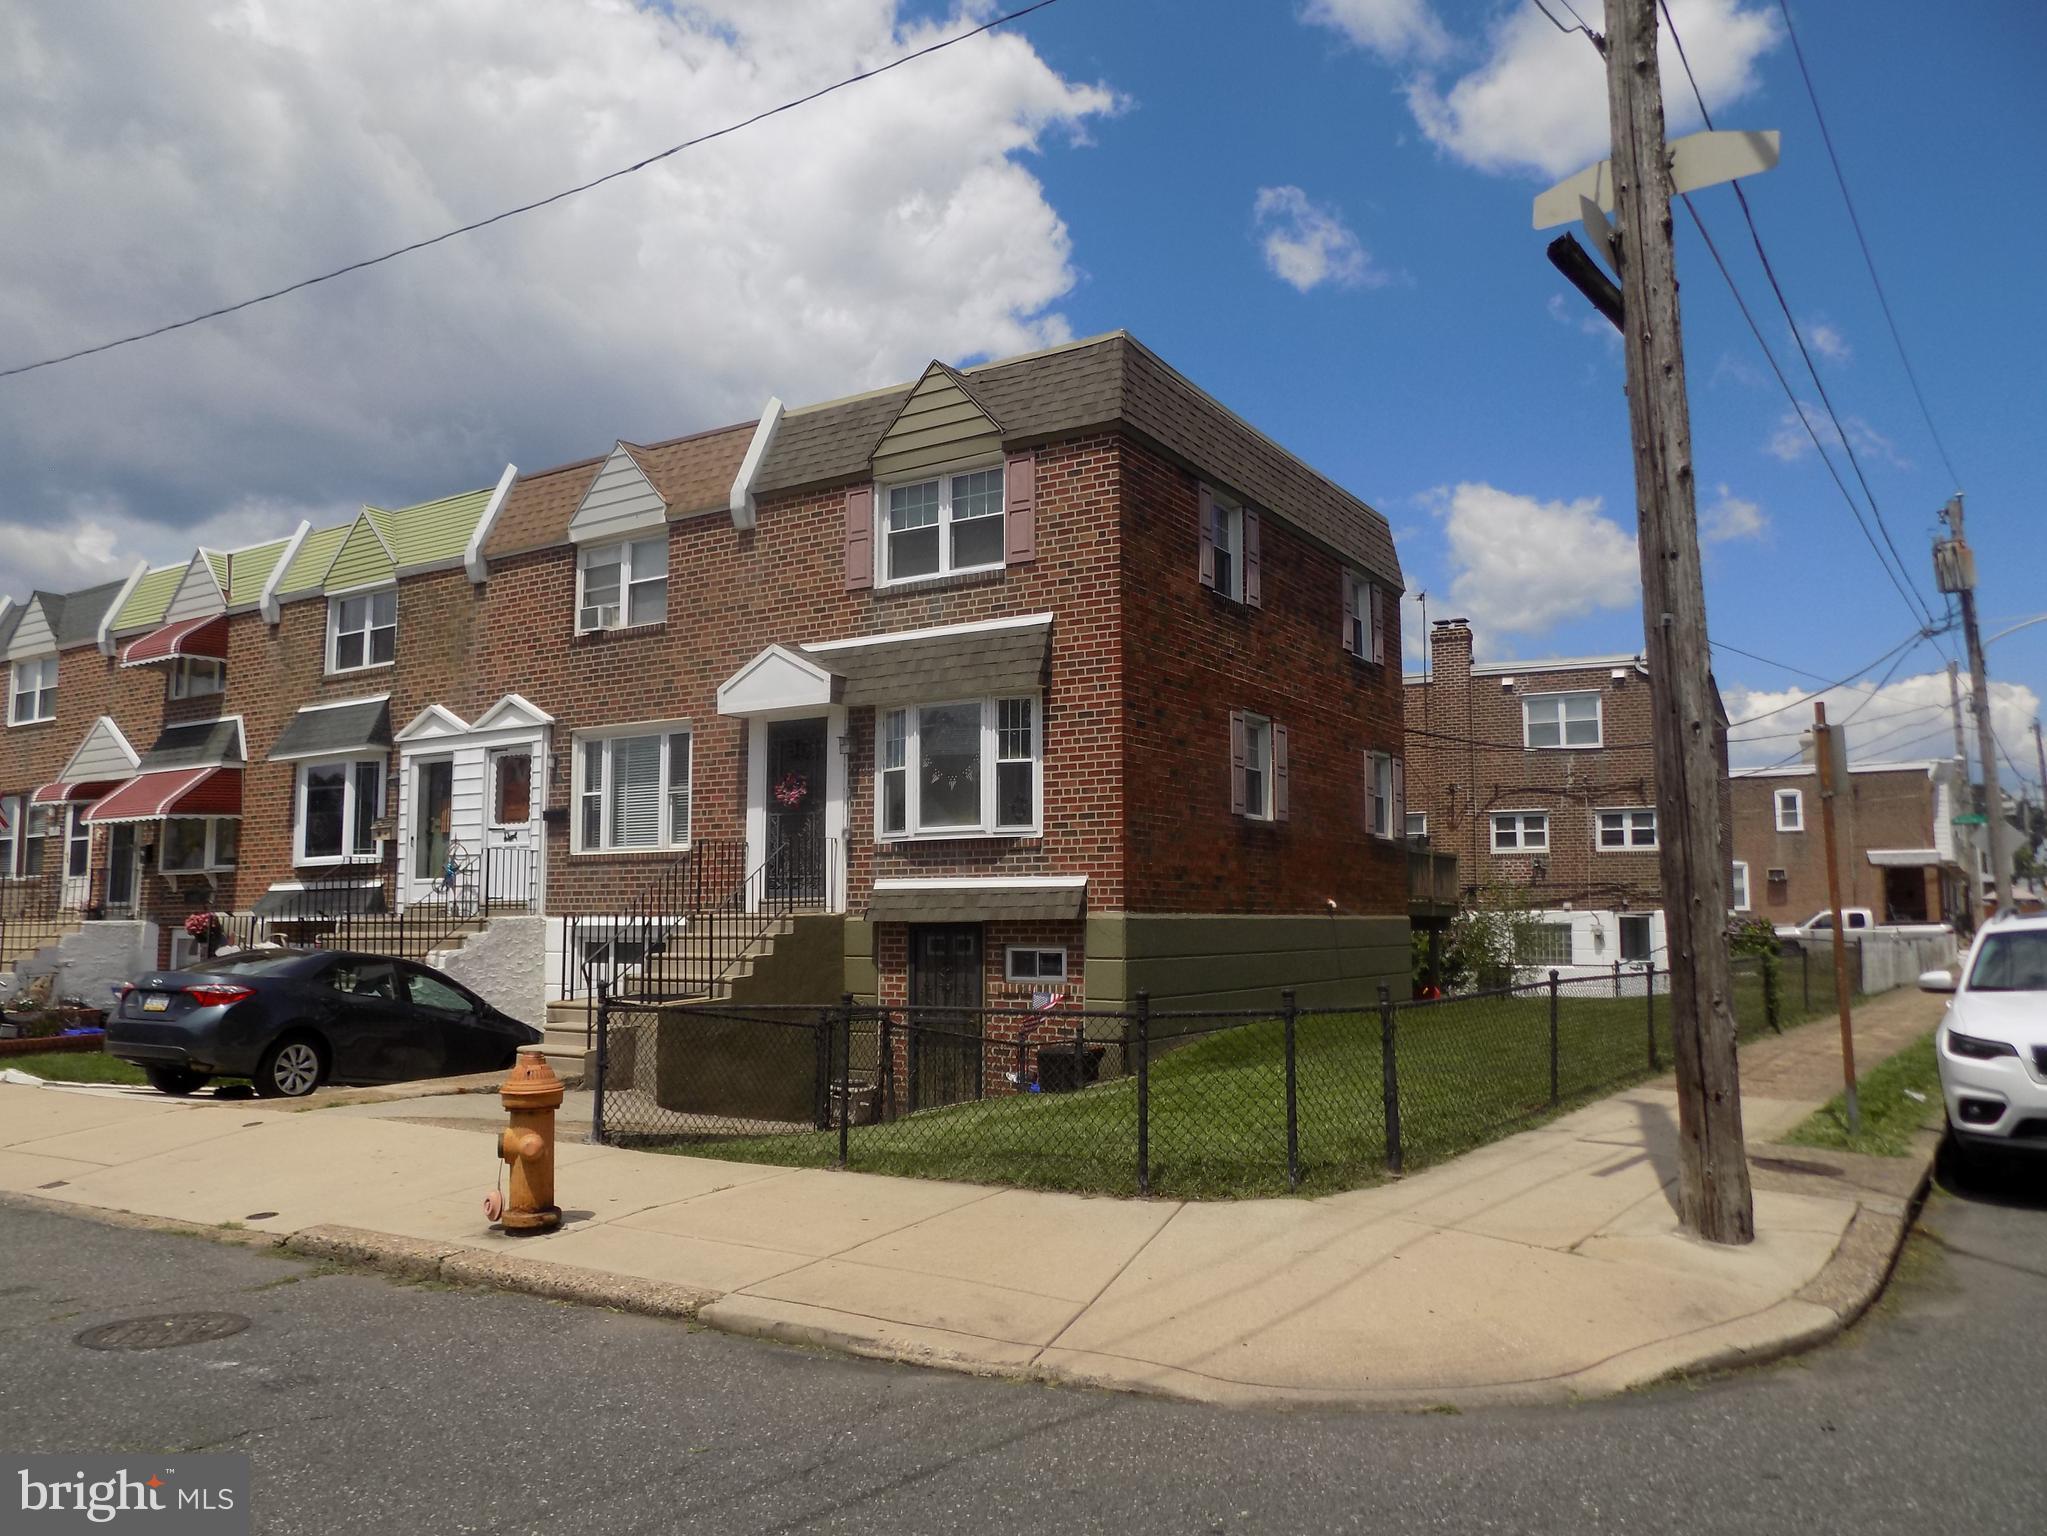 4488 GARDEN STREET, PHILADELPHIA, PA 19137